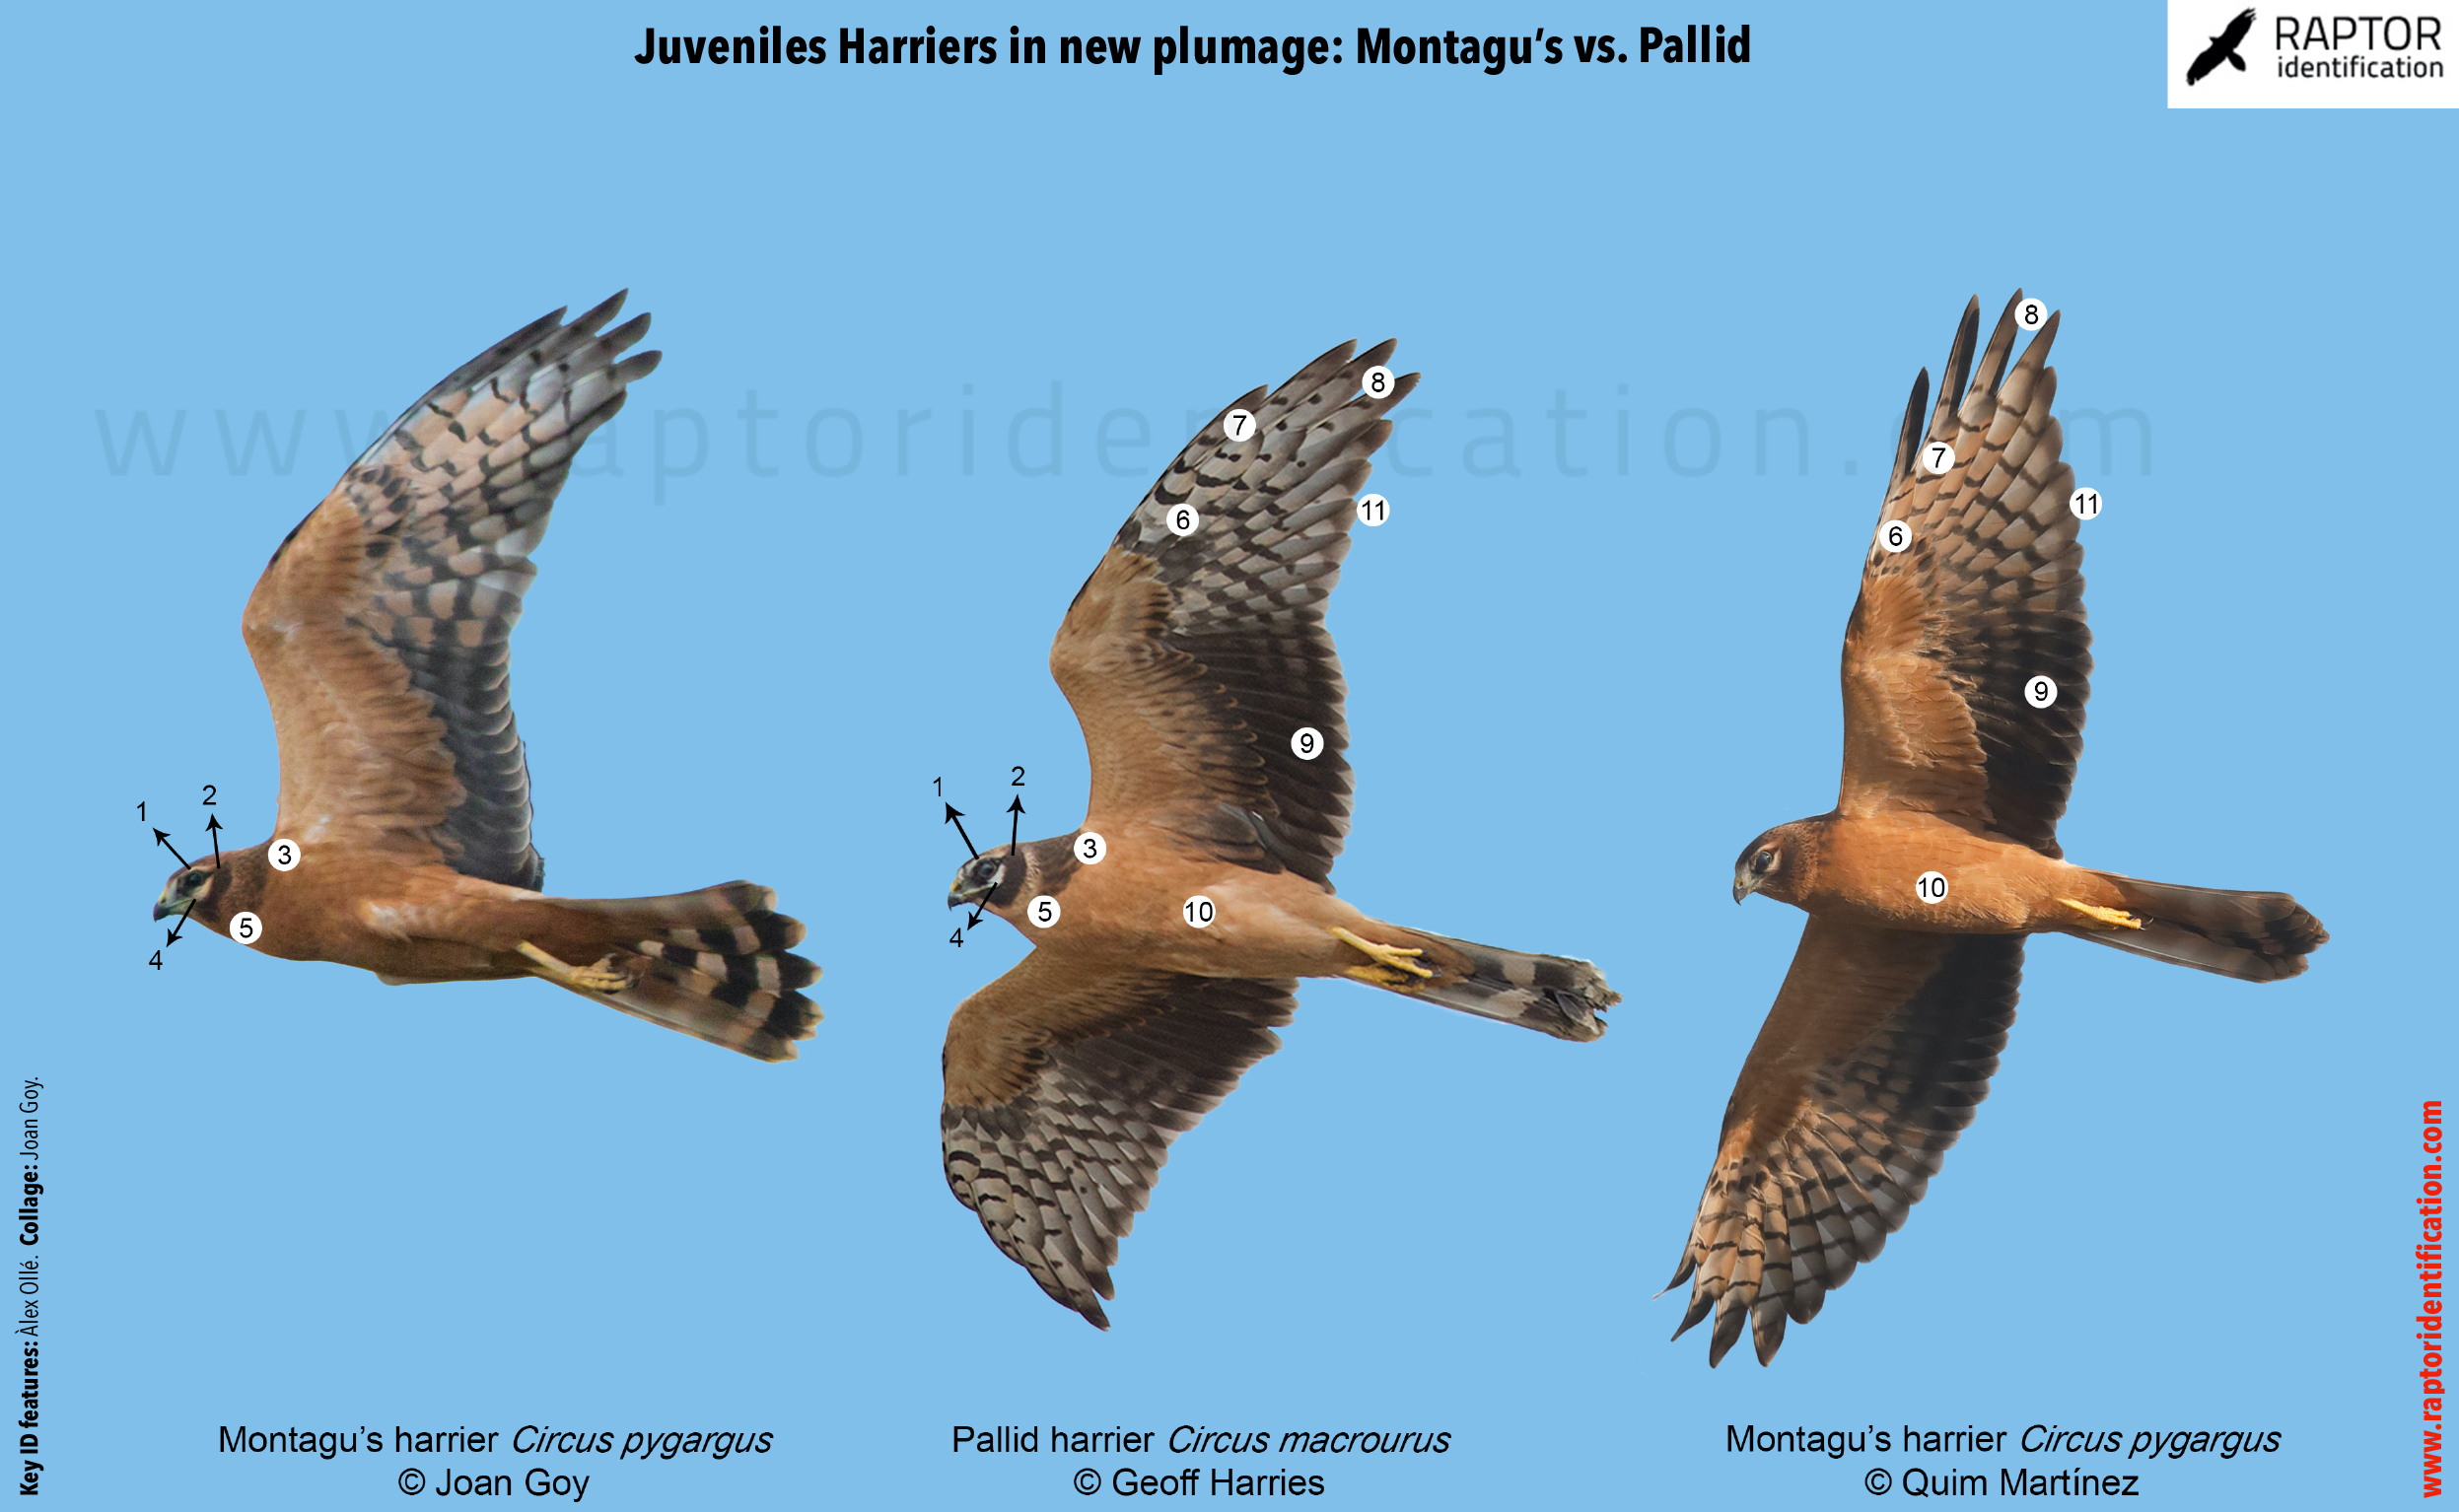 juvenile-harrier-pallid-montagus-identification-circus-macrourus-pygargus